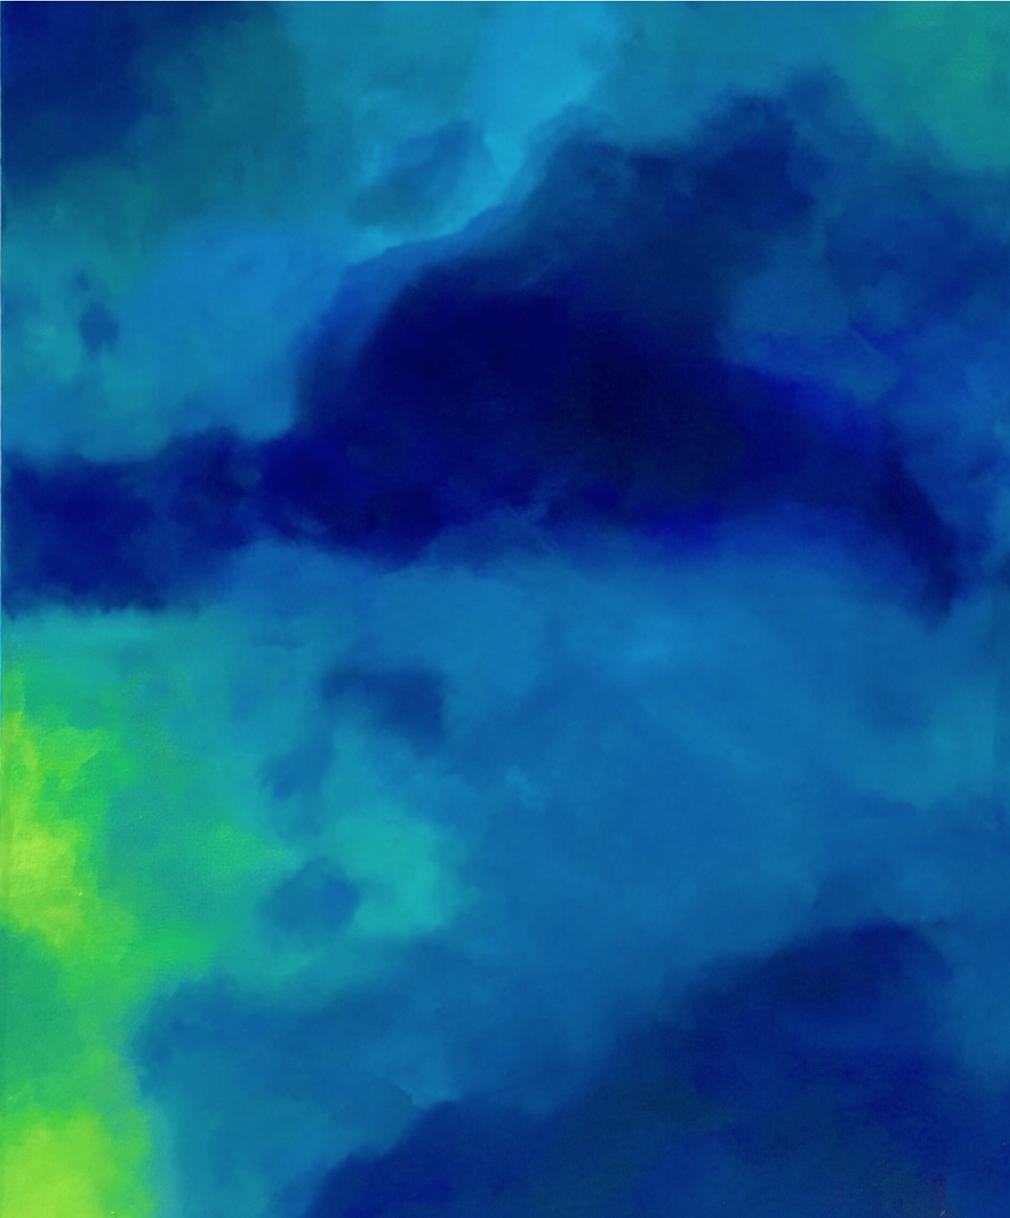 Title: Ocean